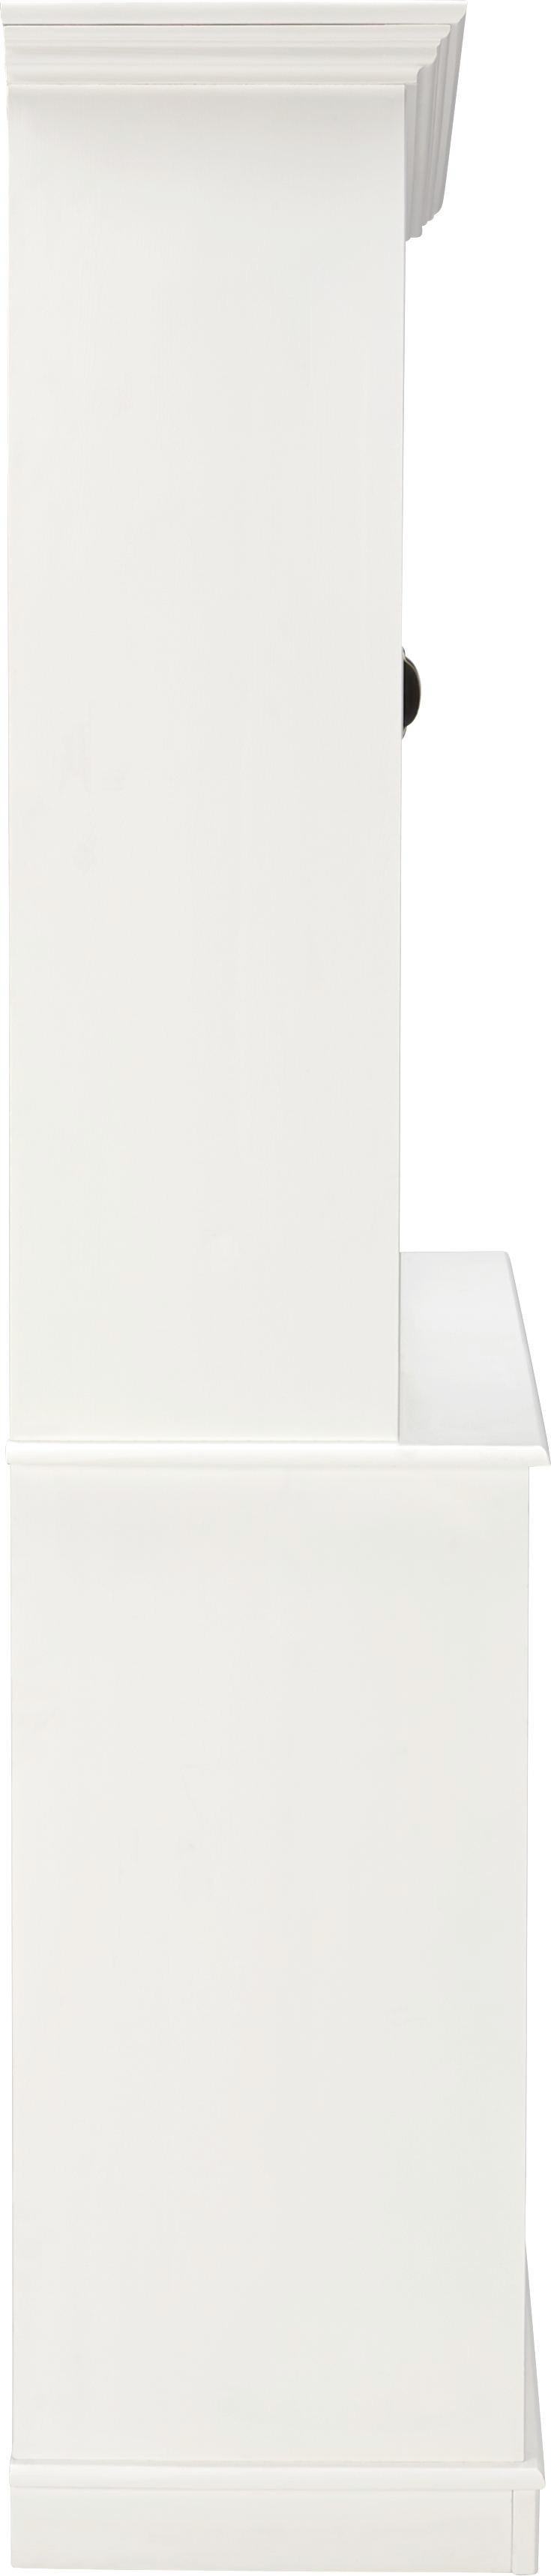 Buffet Claudia - Weiß, ROMANTIK / LANDHAUS, Holz/Metall (140/200/44,5cm) - premium living